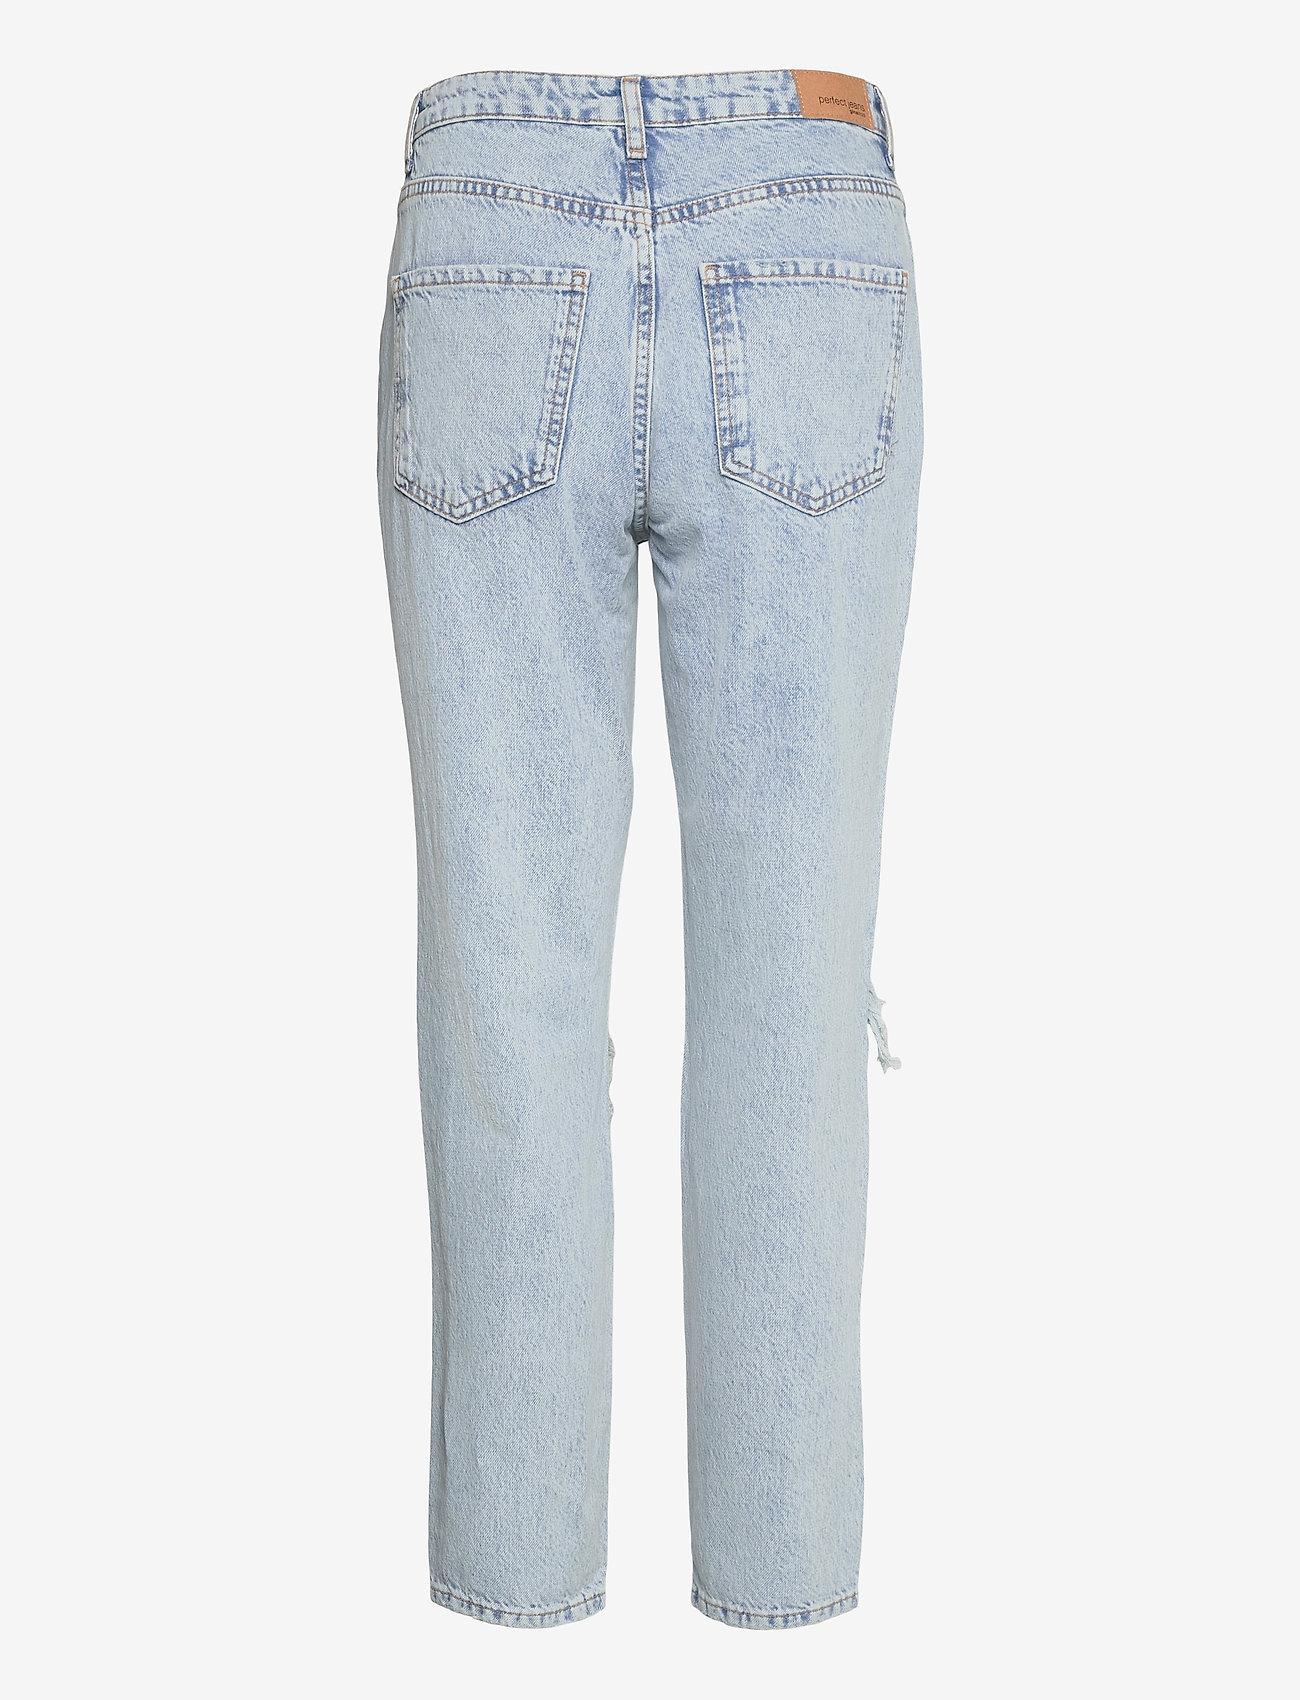 Gina Tricot - Dagny mom jeans - mom jeans - sky blue dest (5070) - 1